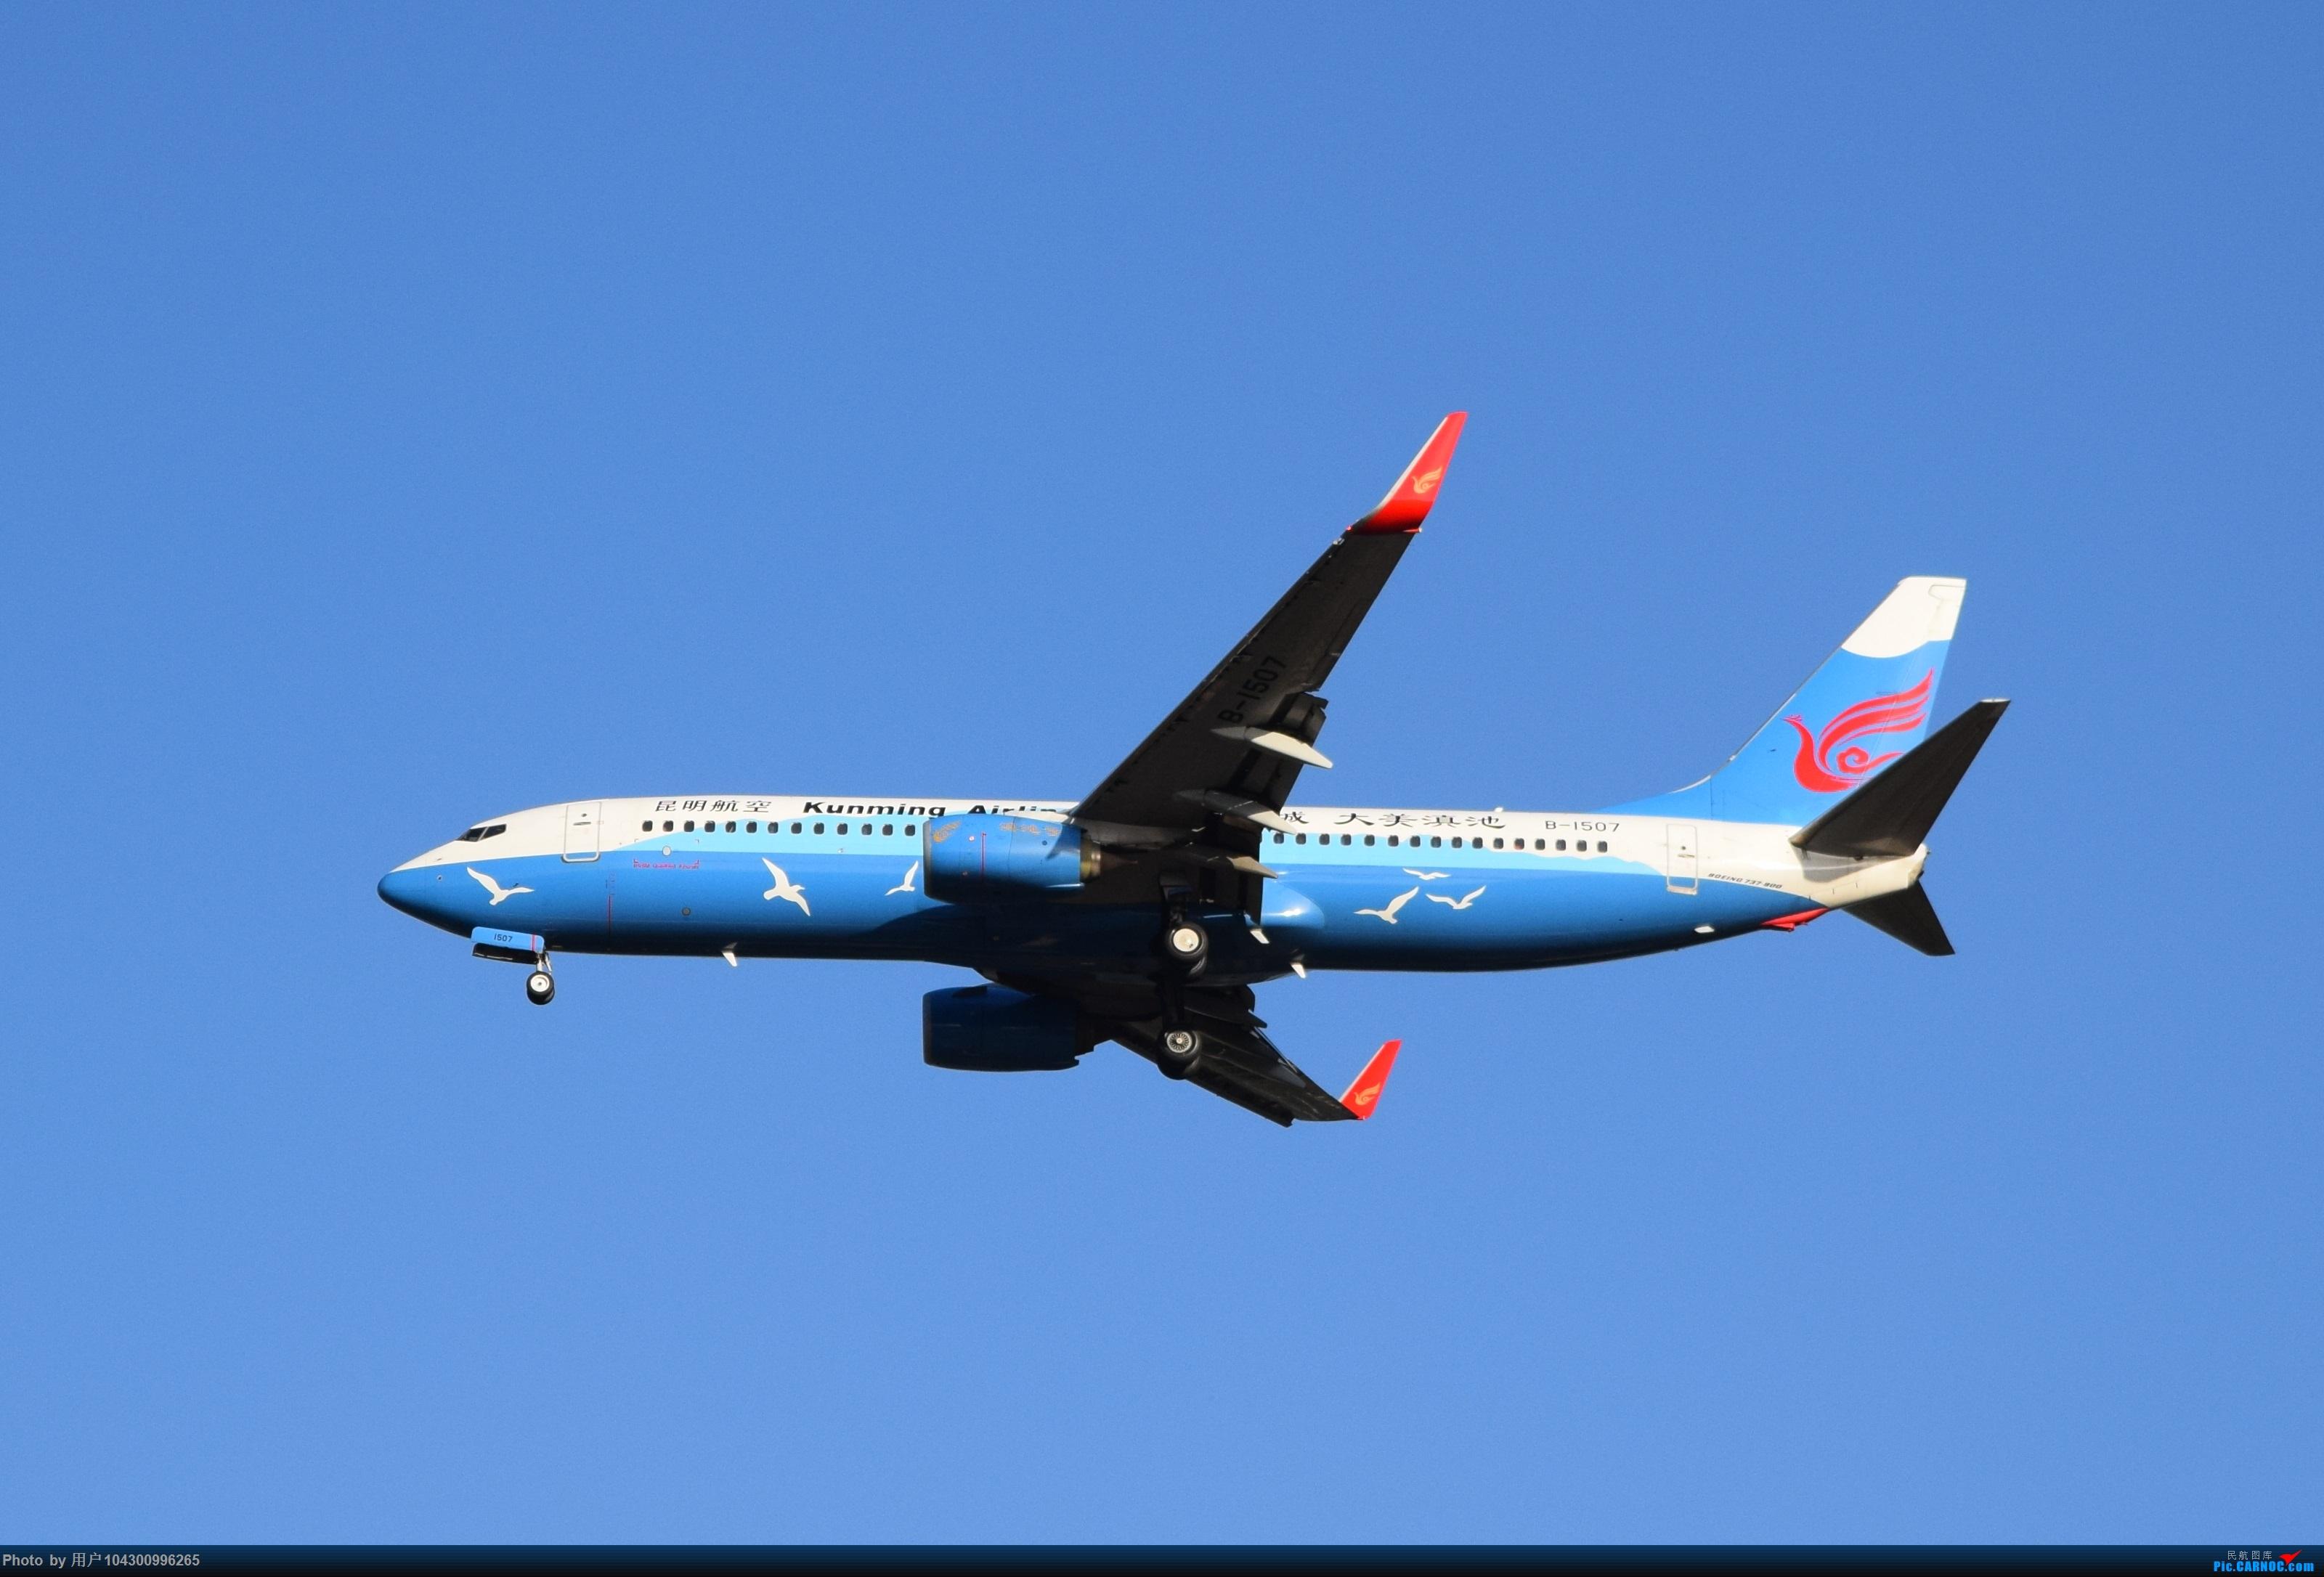 Re:[原创][KWE]贵阳今天天气不错,随便拍几张! BOEING 737-800 B-1507 中国贵阳龙洞堡国际机场